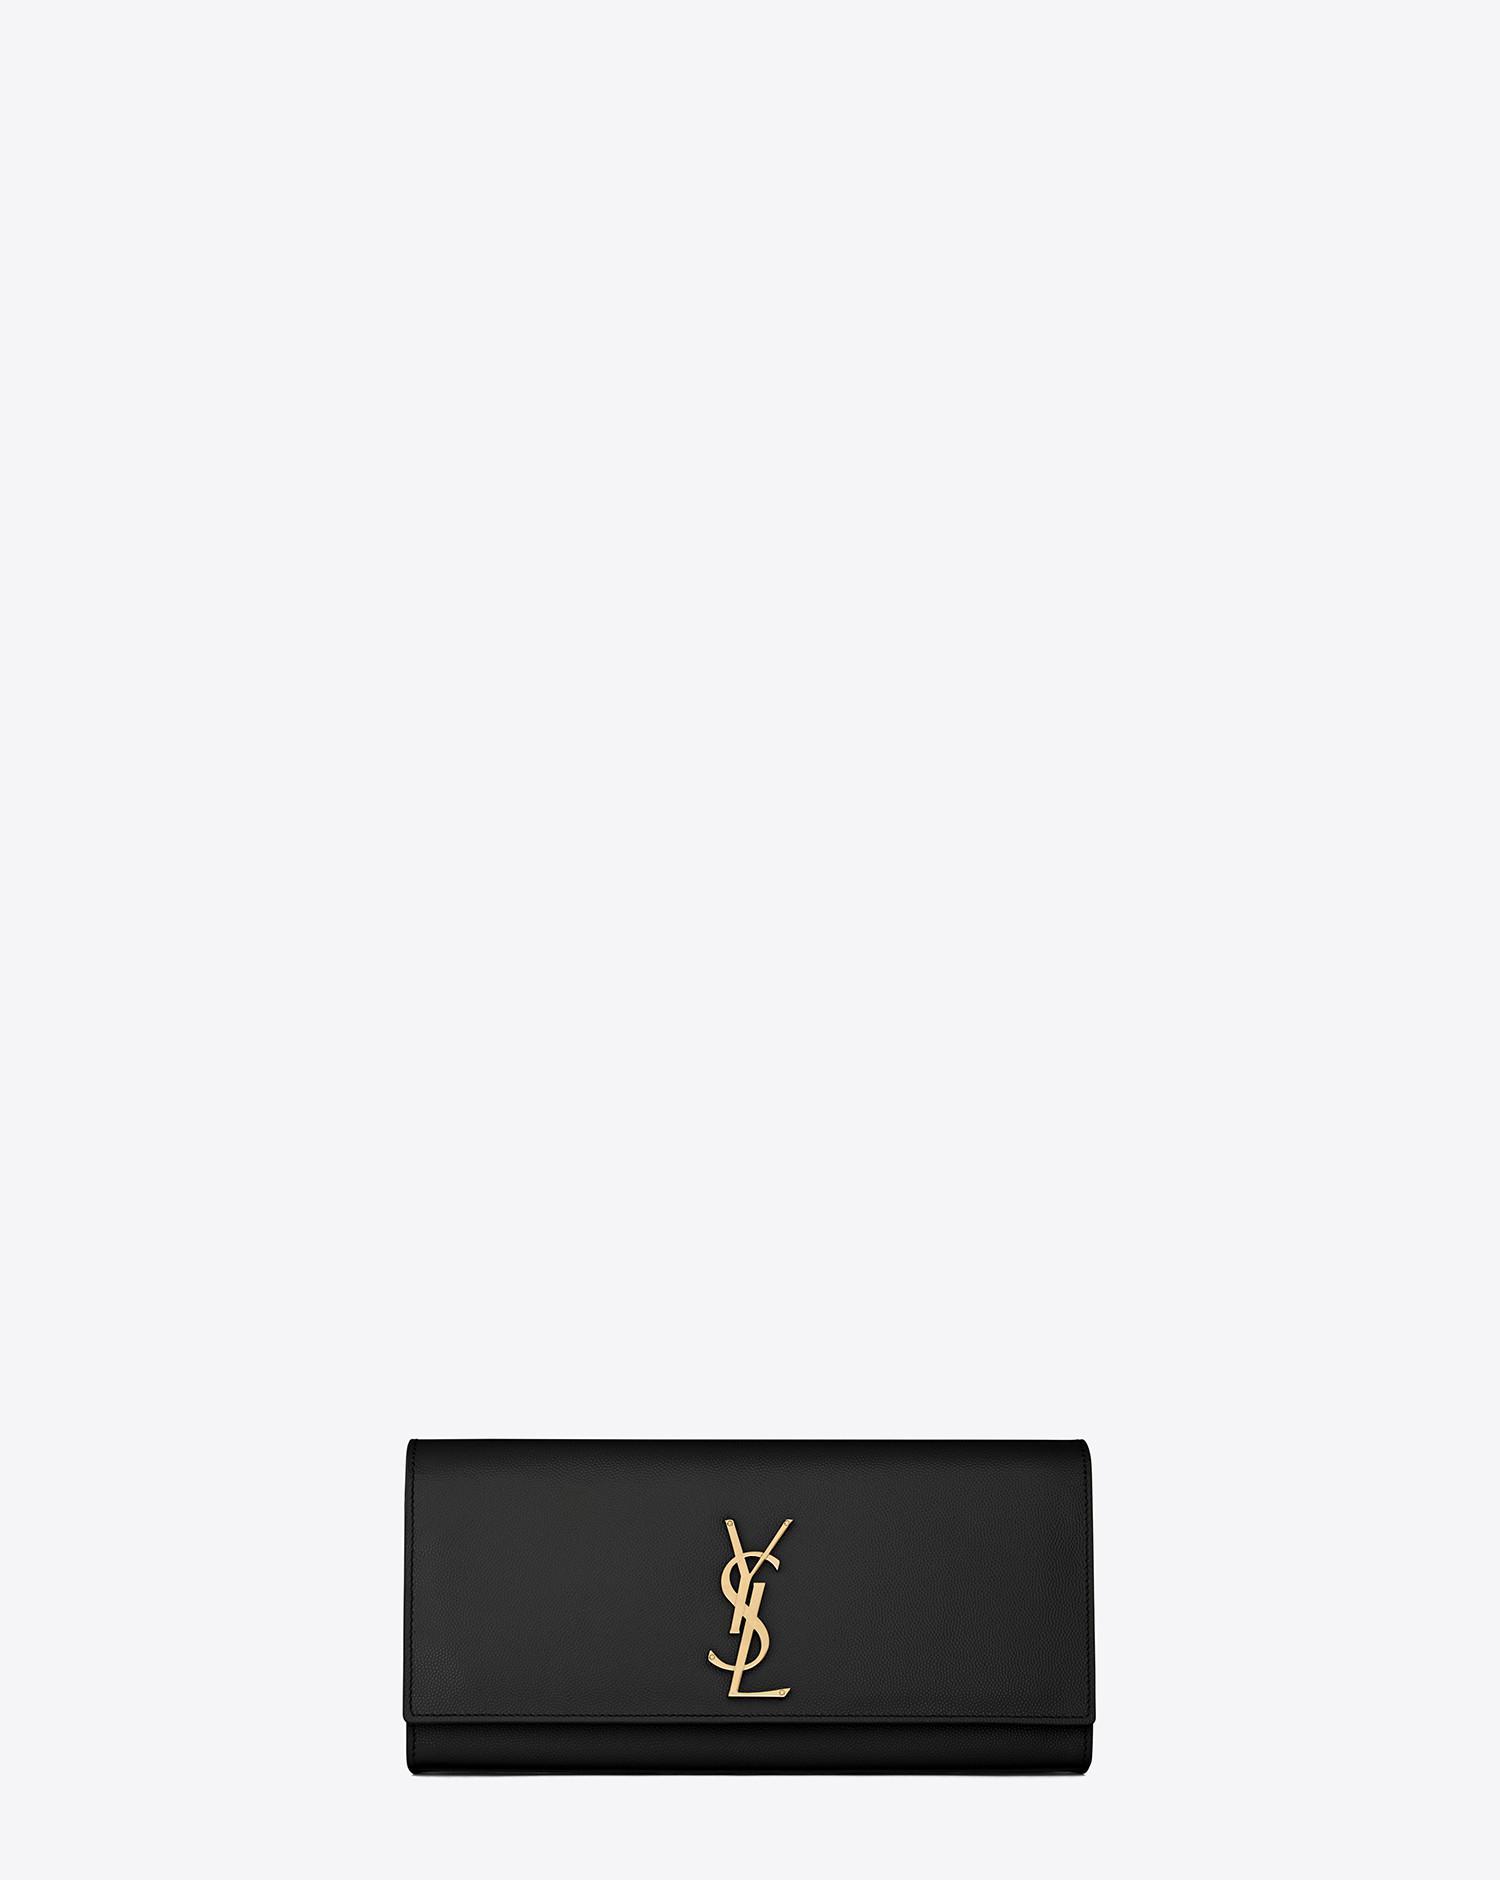 2d452164259a Lyst - Saint Laurent Kate Clutch In Grain De Poudre Embossed Leather in  Black